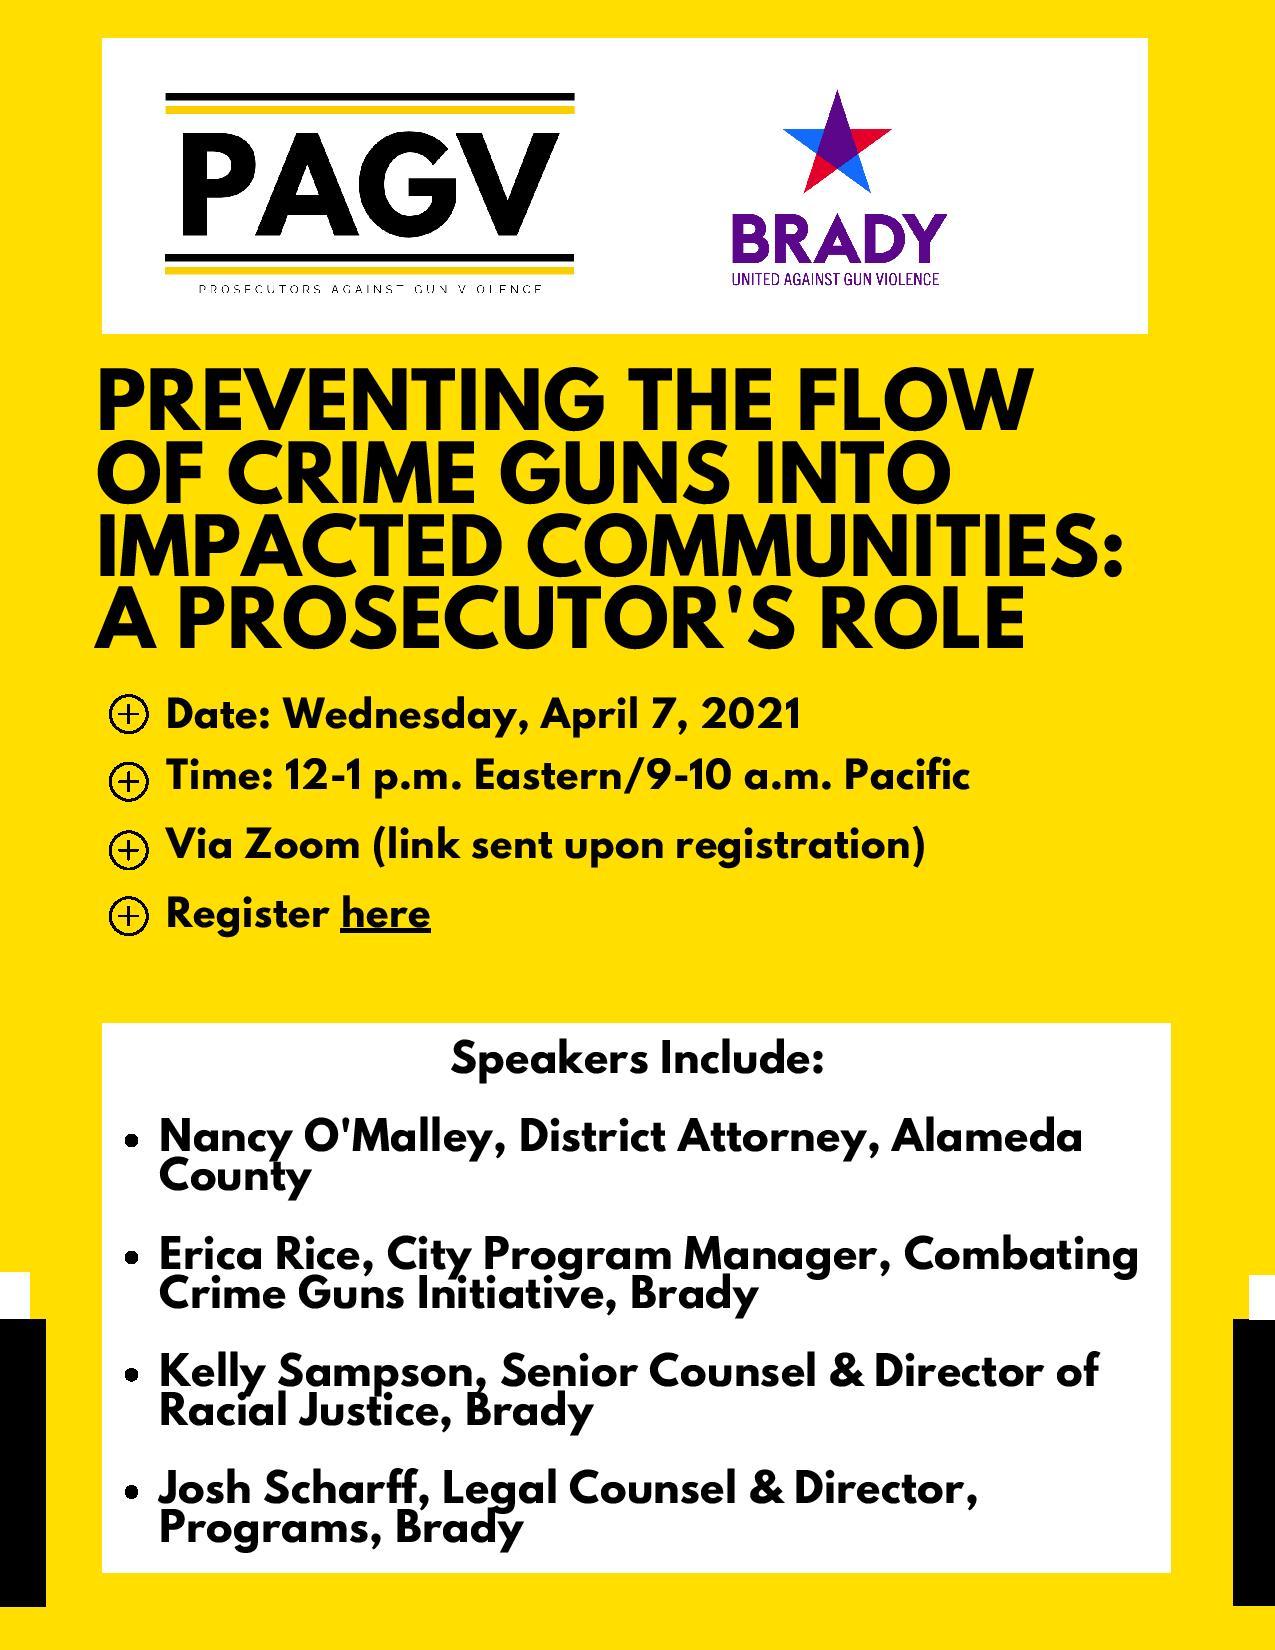 PAGV-Brady April 7 Summit Flyer-page-001